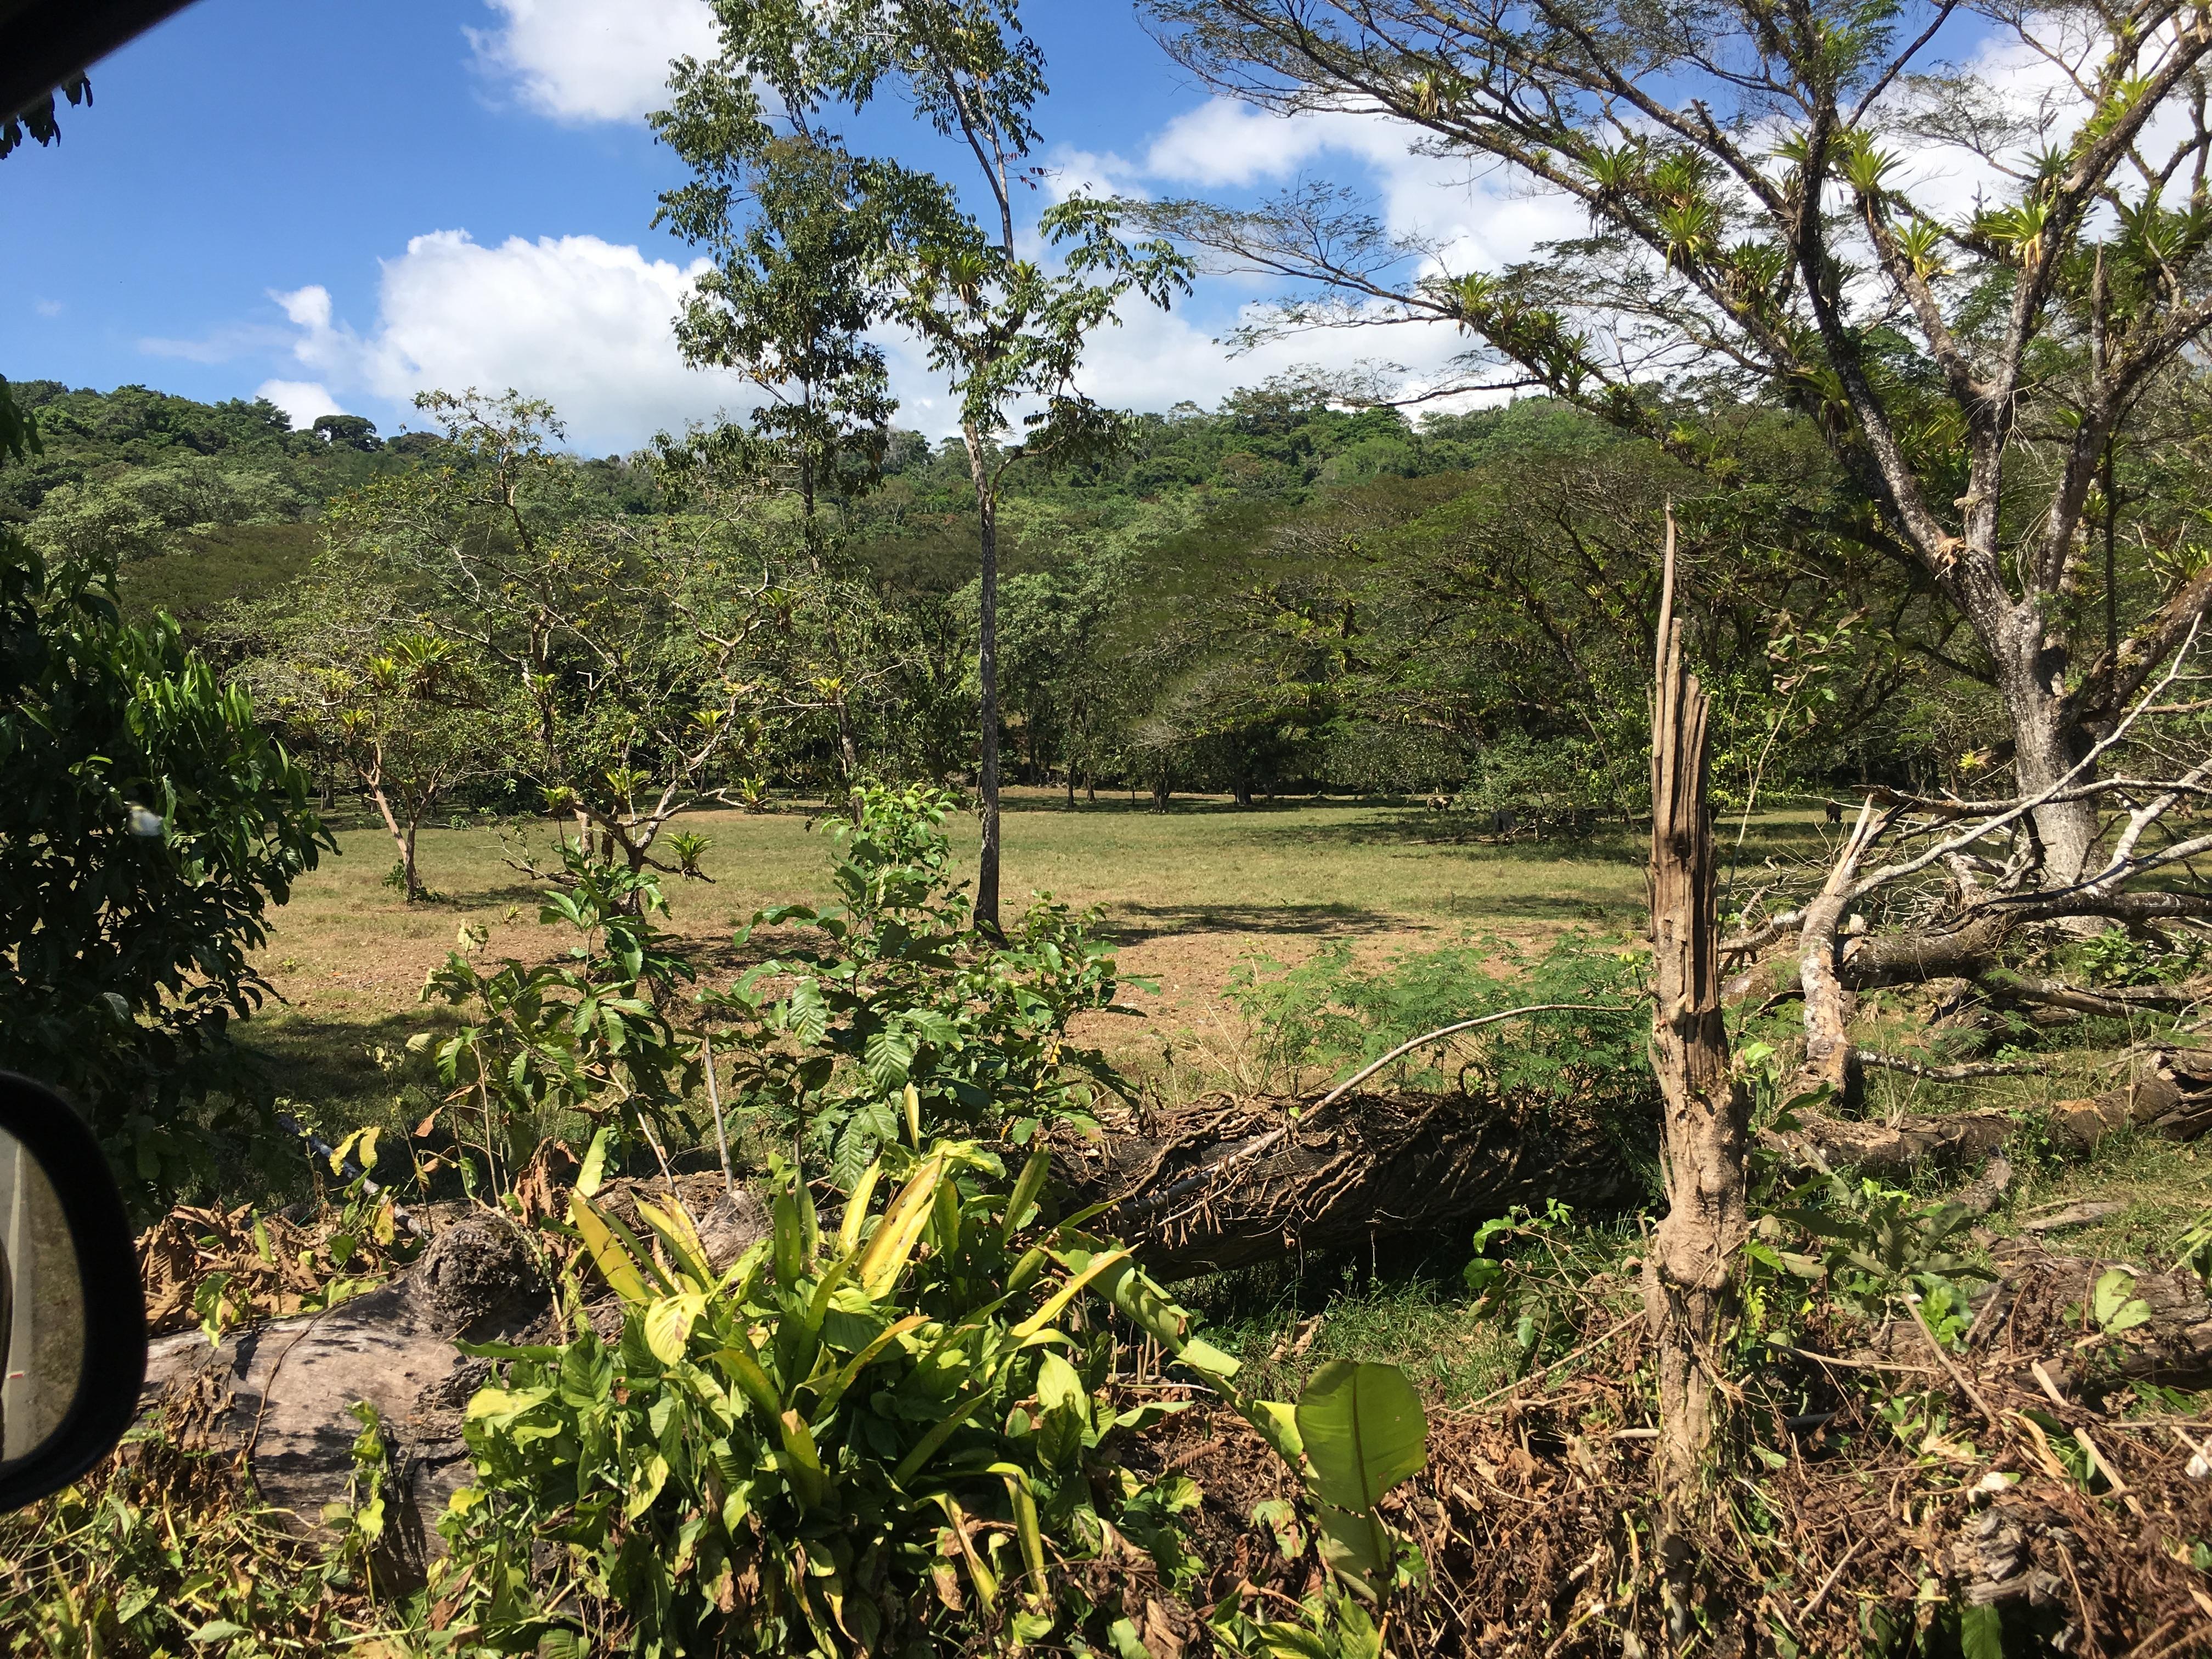 Dominical-Costa-Rica-property-costaricarealestateDOM331-2.jpg